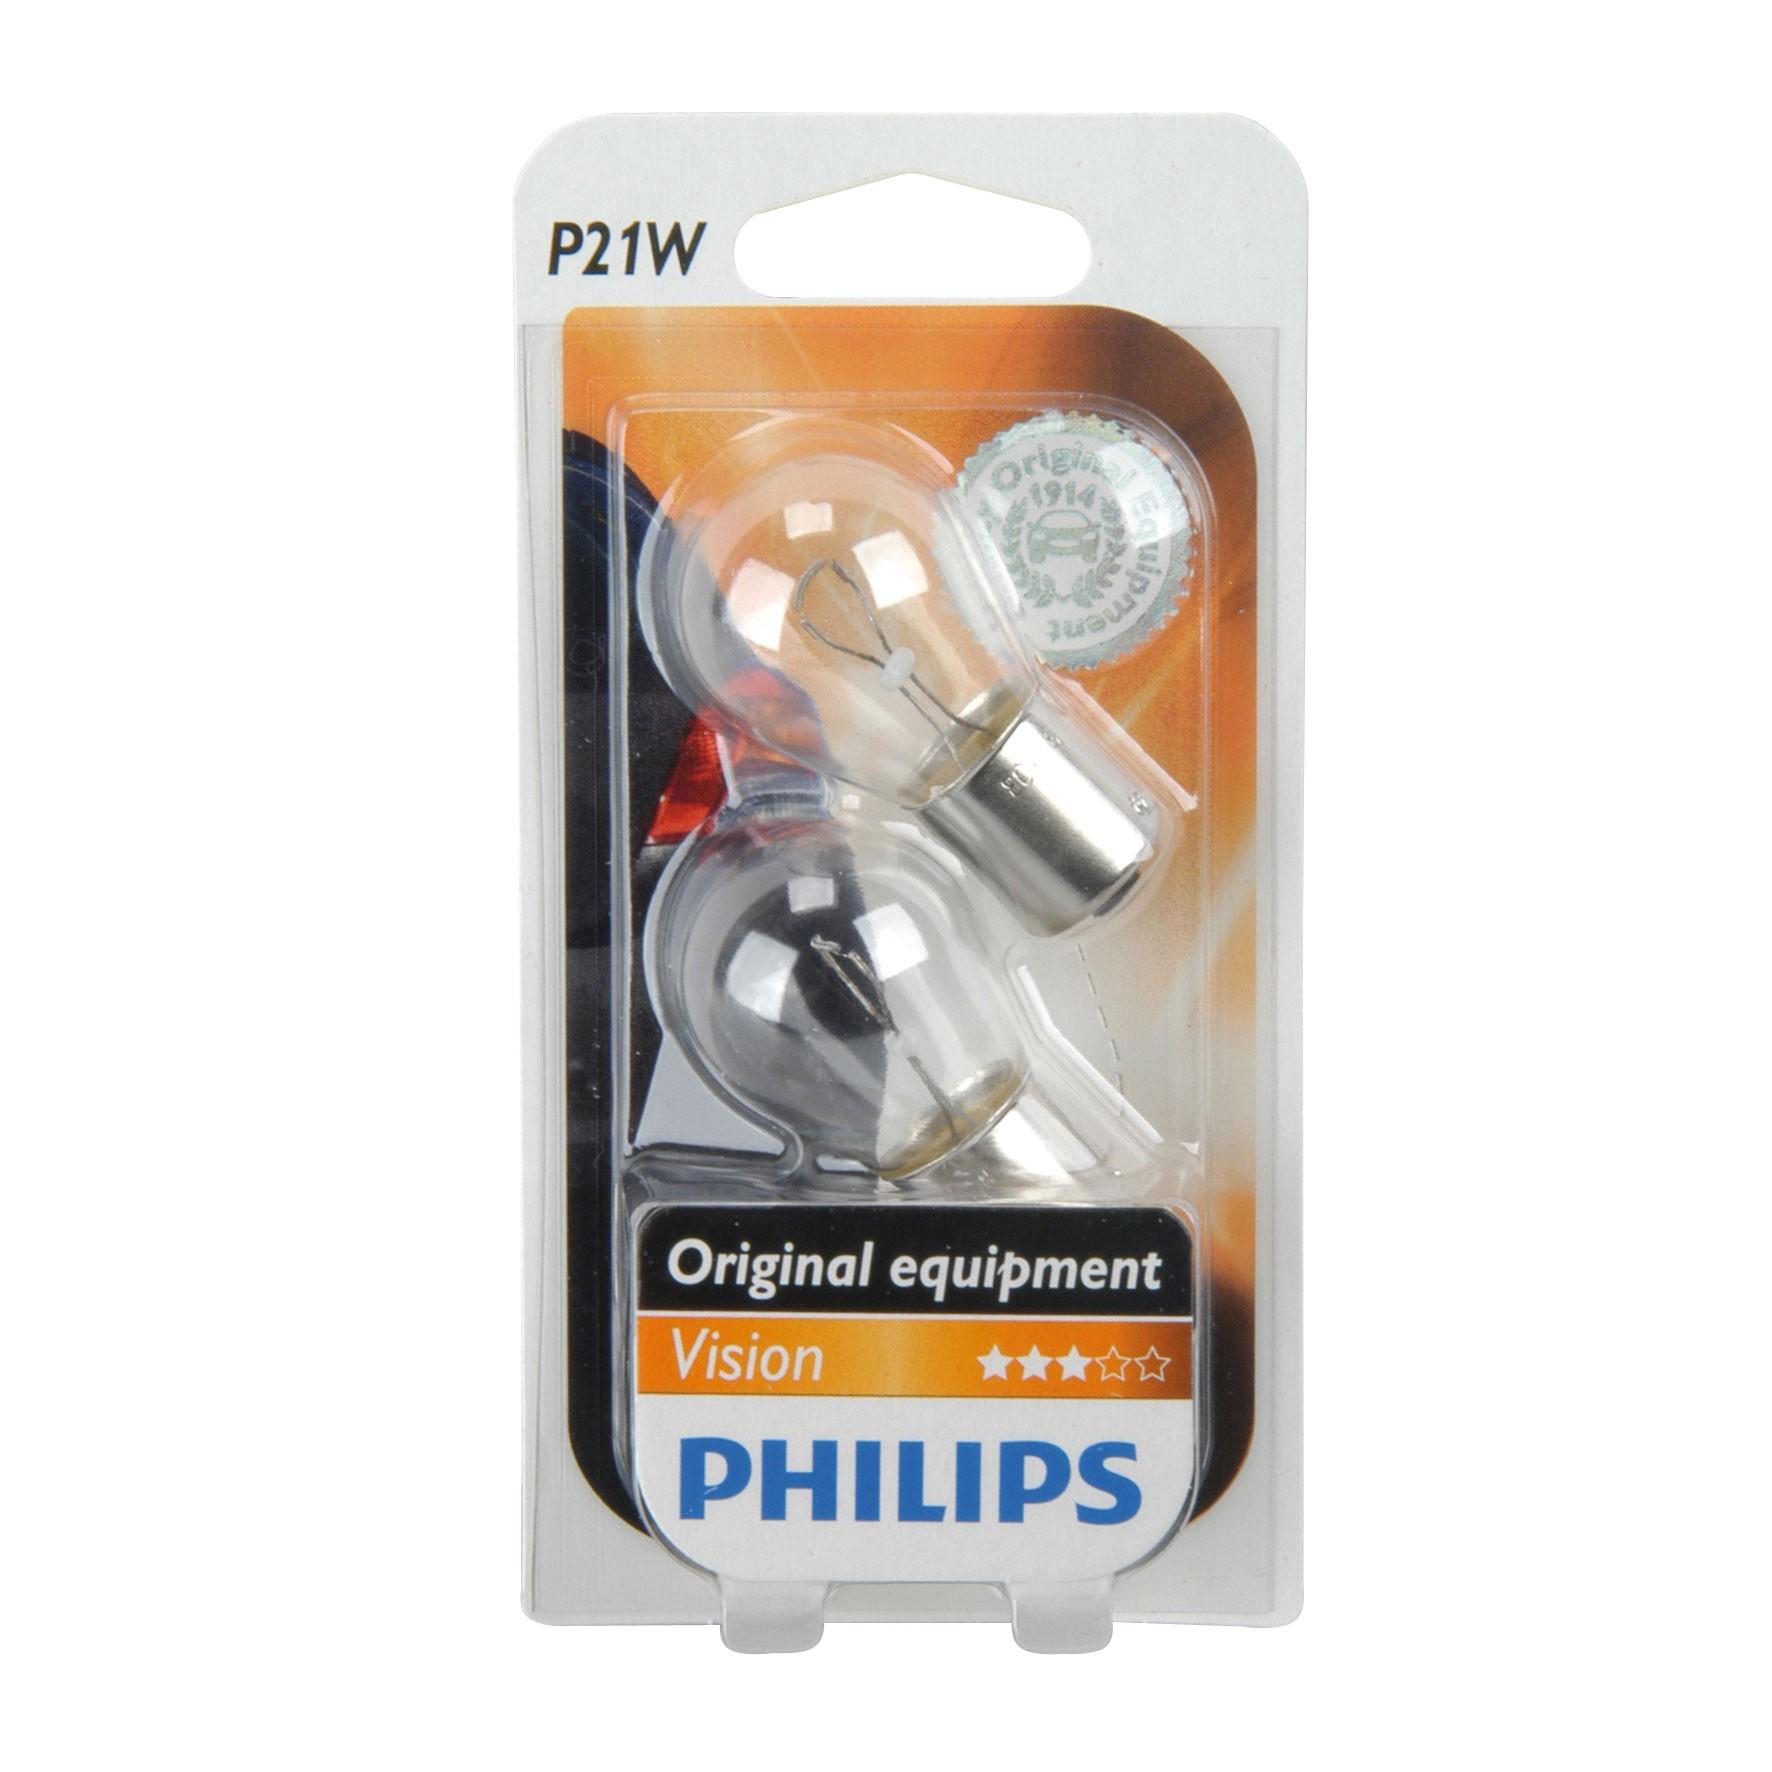 Philips Vision Kugellampe P21W 12Volt / 21Watt 2er Pack - Autobeleuch. Bild 1